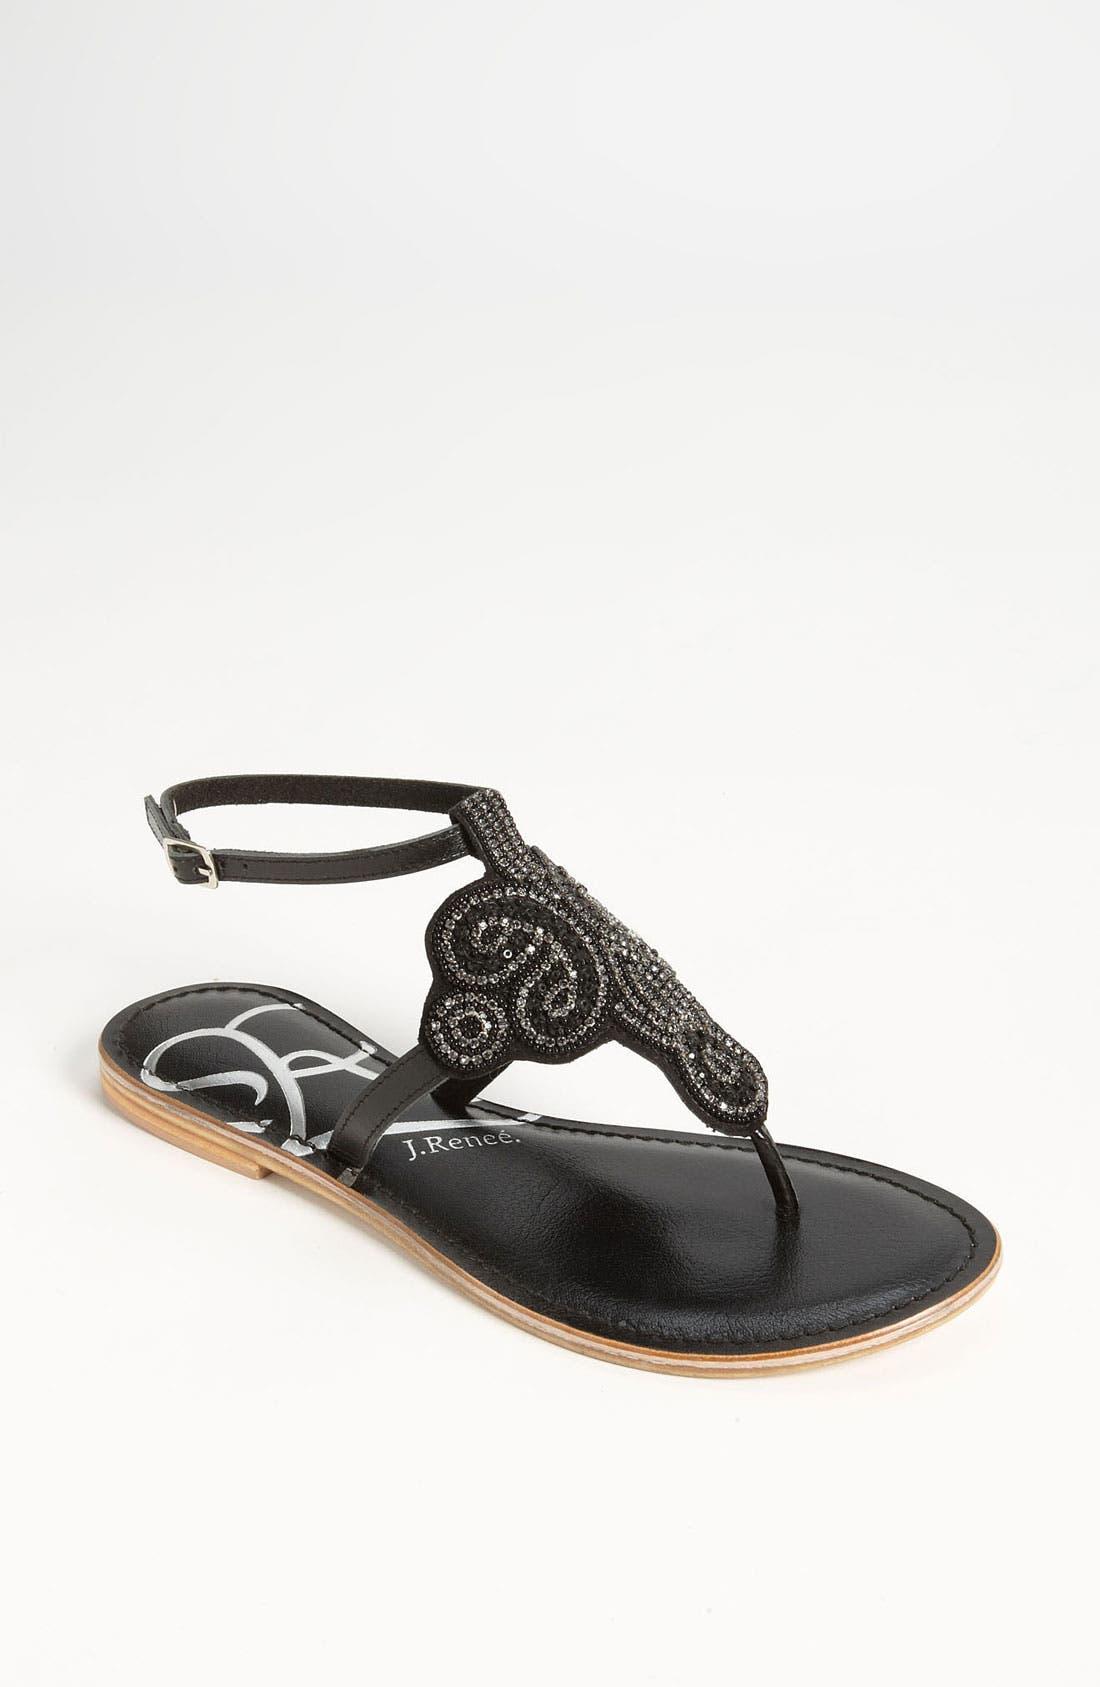 Main Image - J. Reneé 'Glint' Sandal